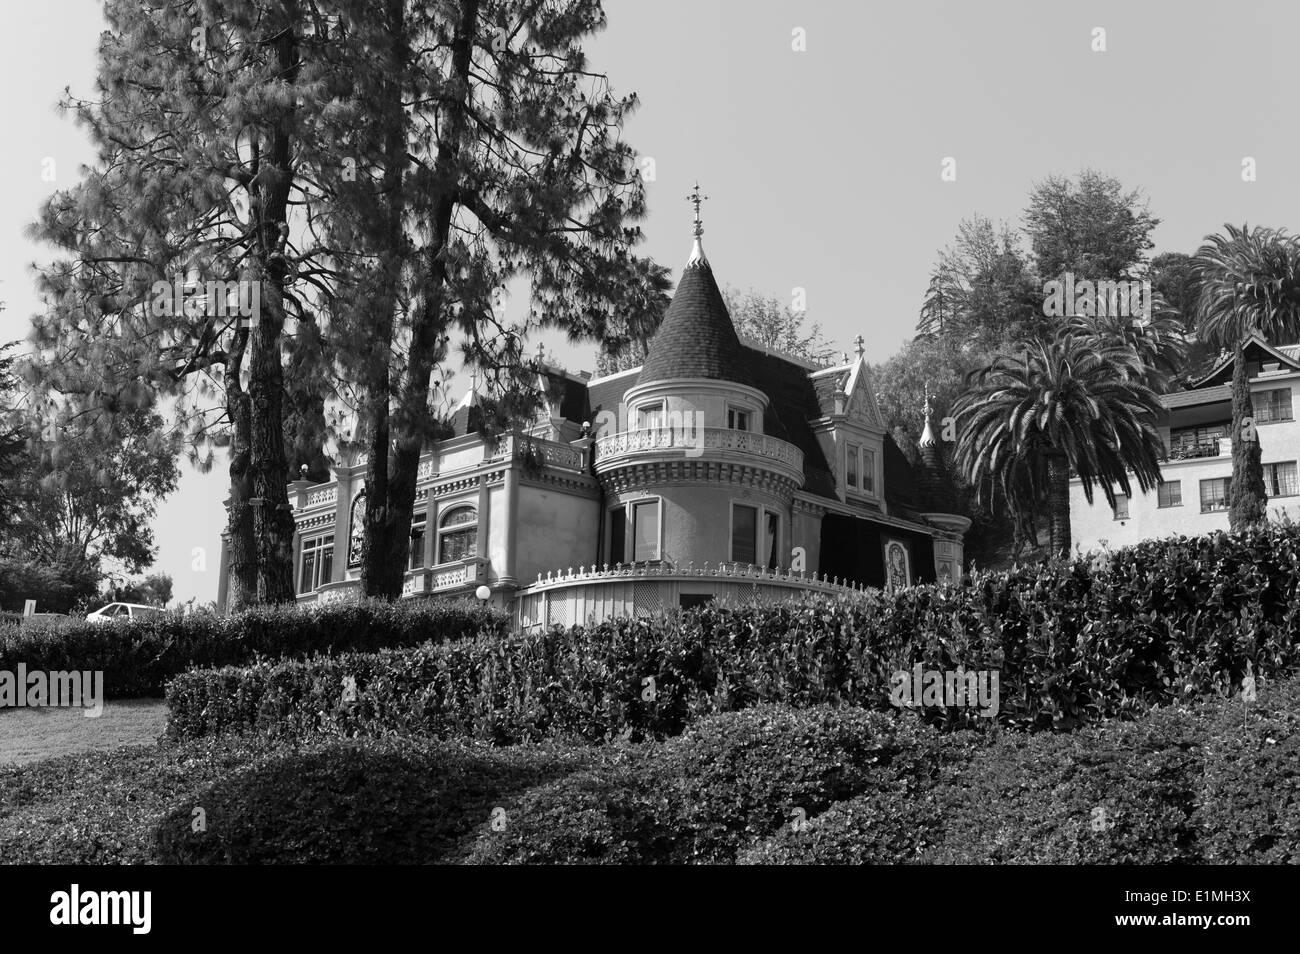 Hollywood-Akademie der magischen Künste, Magic Castle, Hollywood, CA. Stockbild